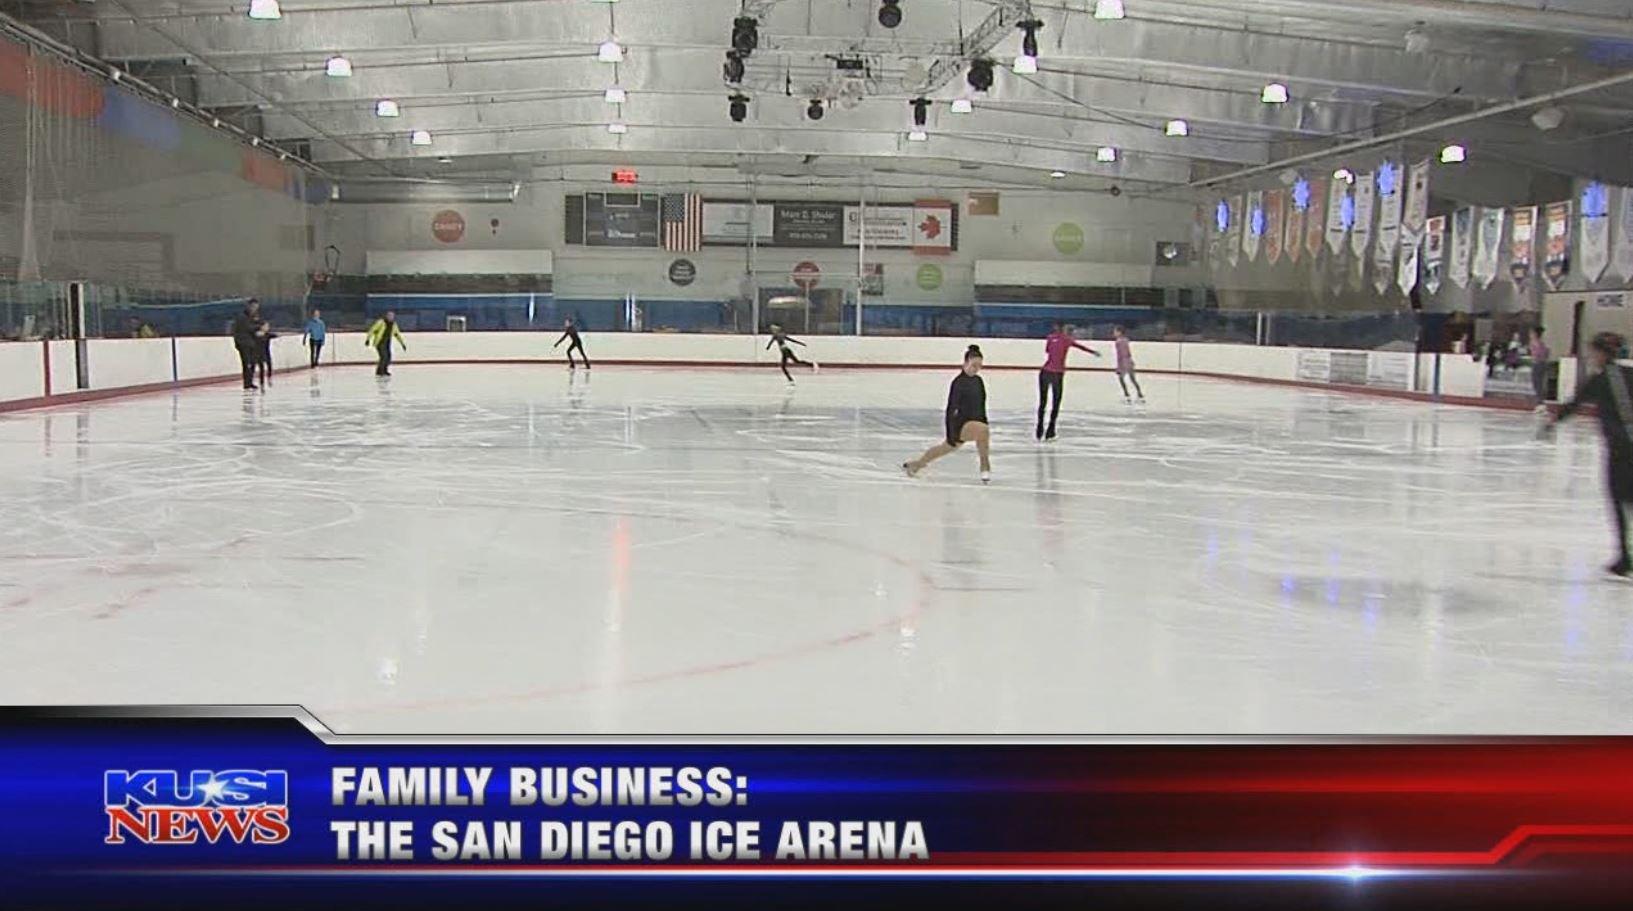 Family Business: San Diego Ice Arena